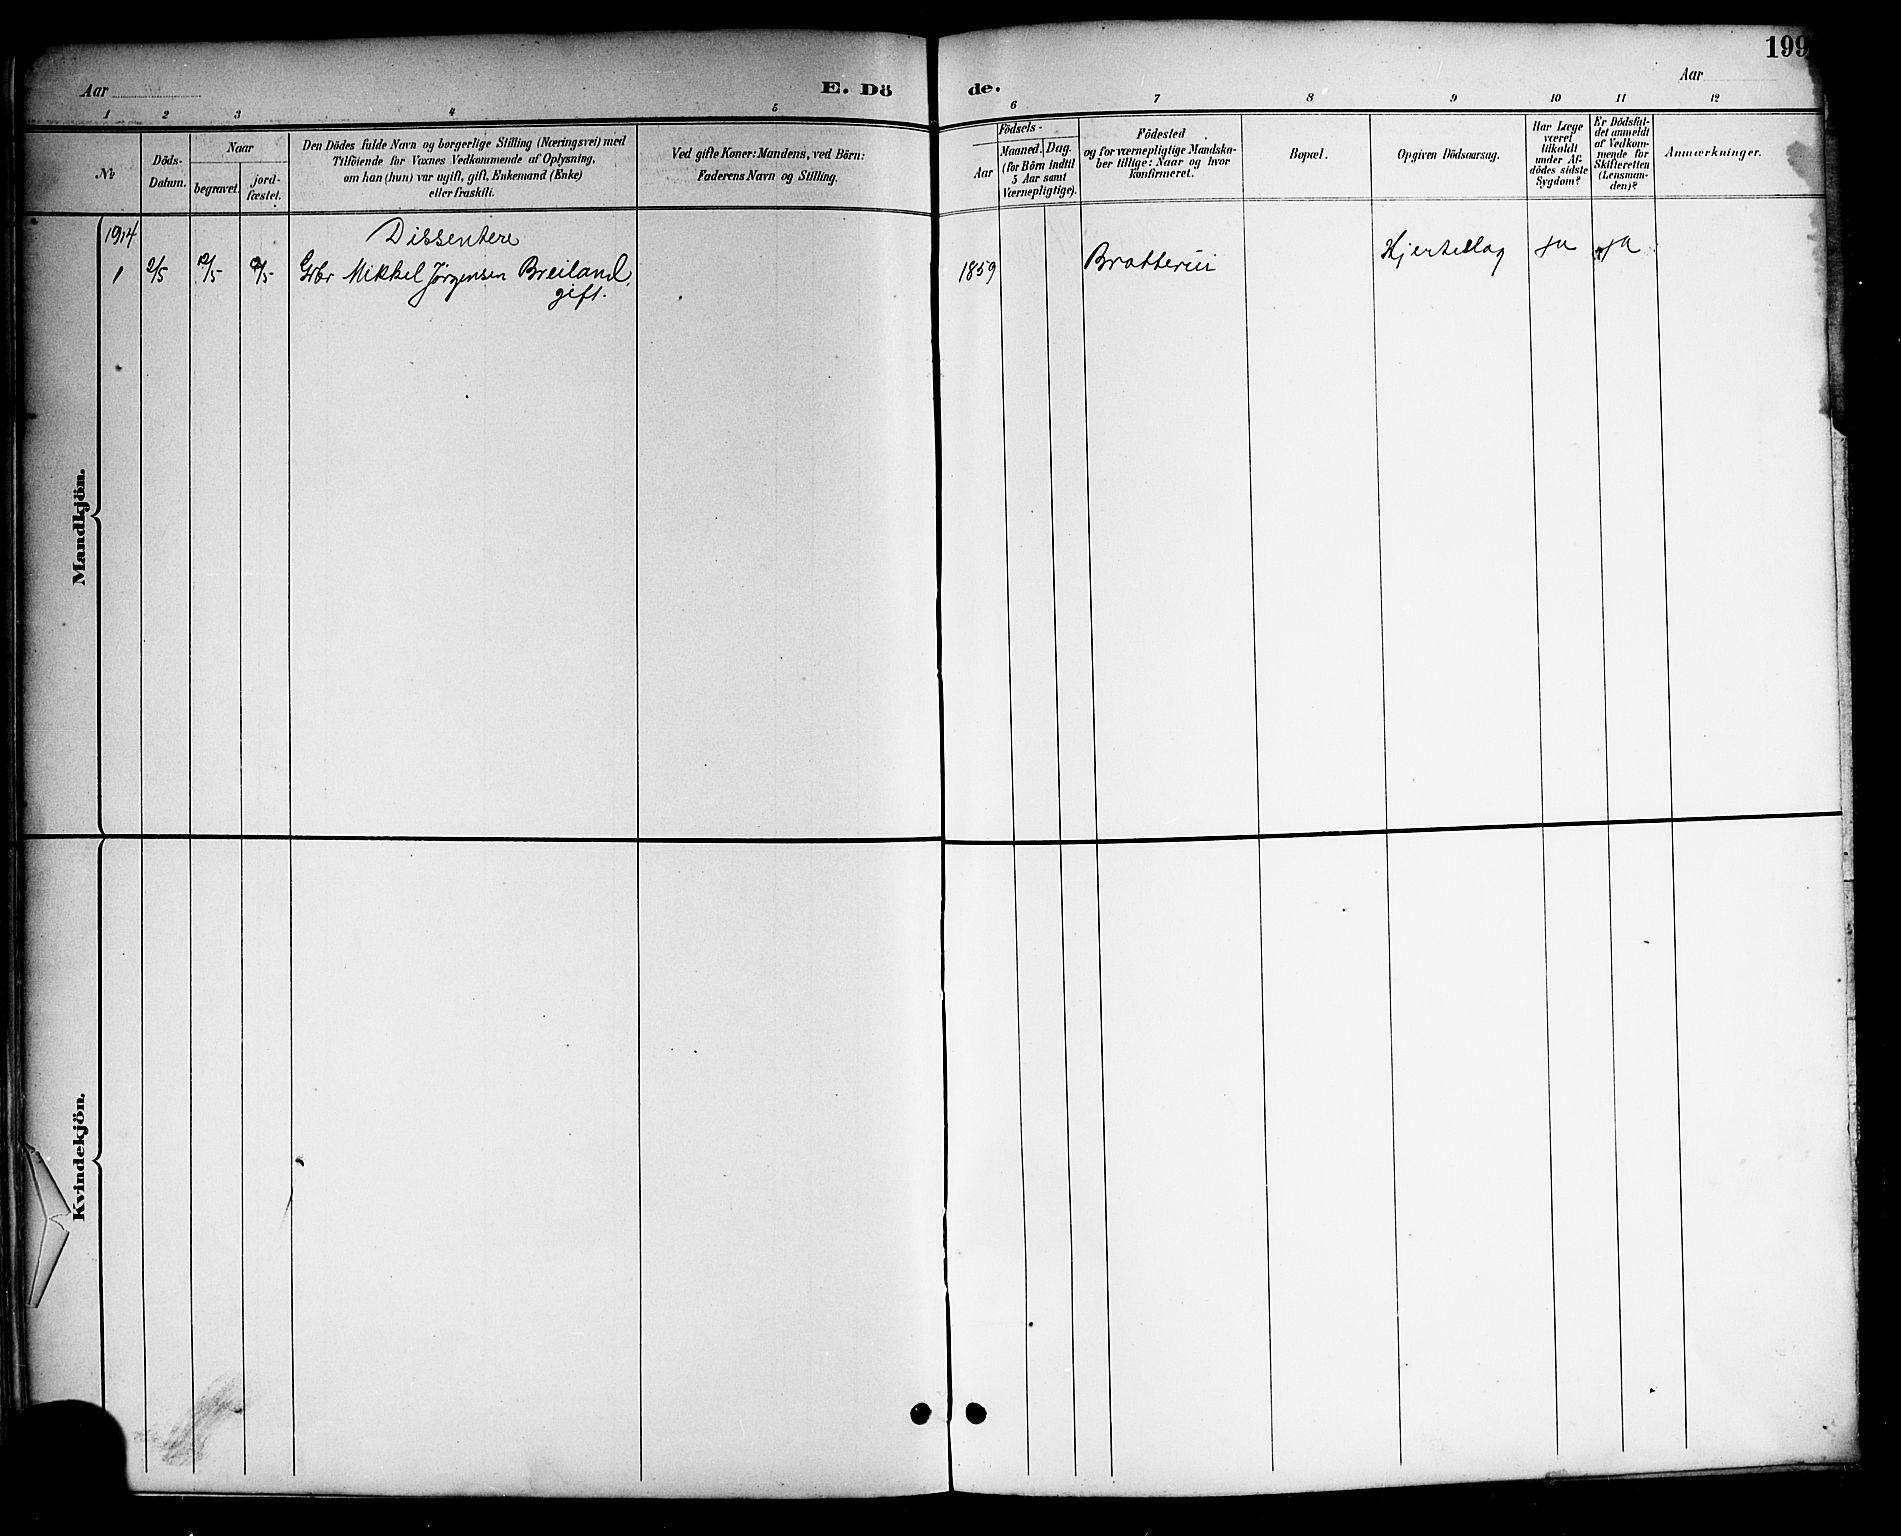 SAKO, Drangedal kirkebøker, G/Gb/L0002: Klokkerbok nr. II 2, 1895-1918, s. 199